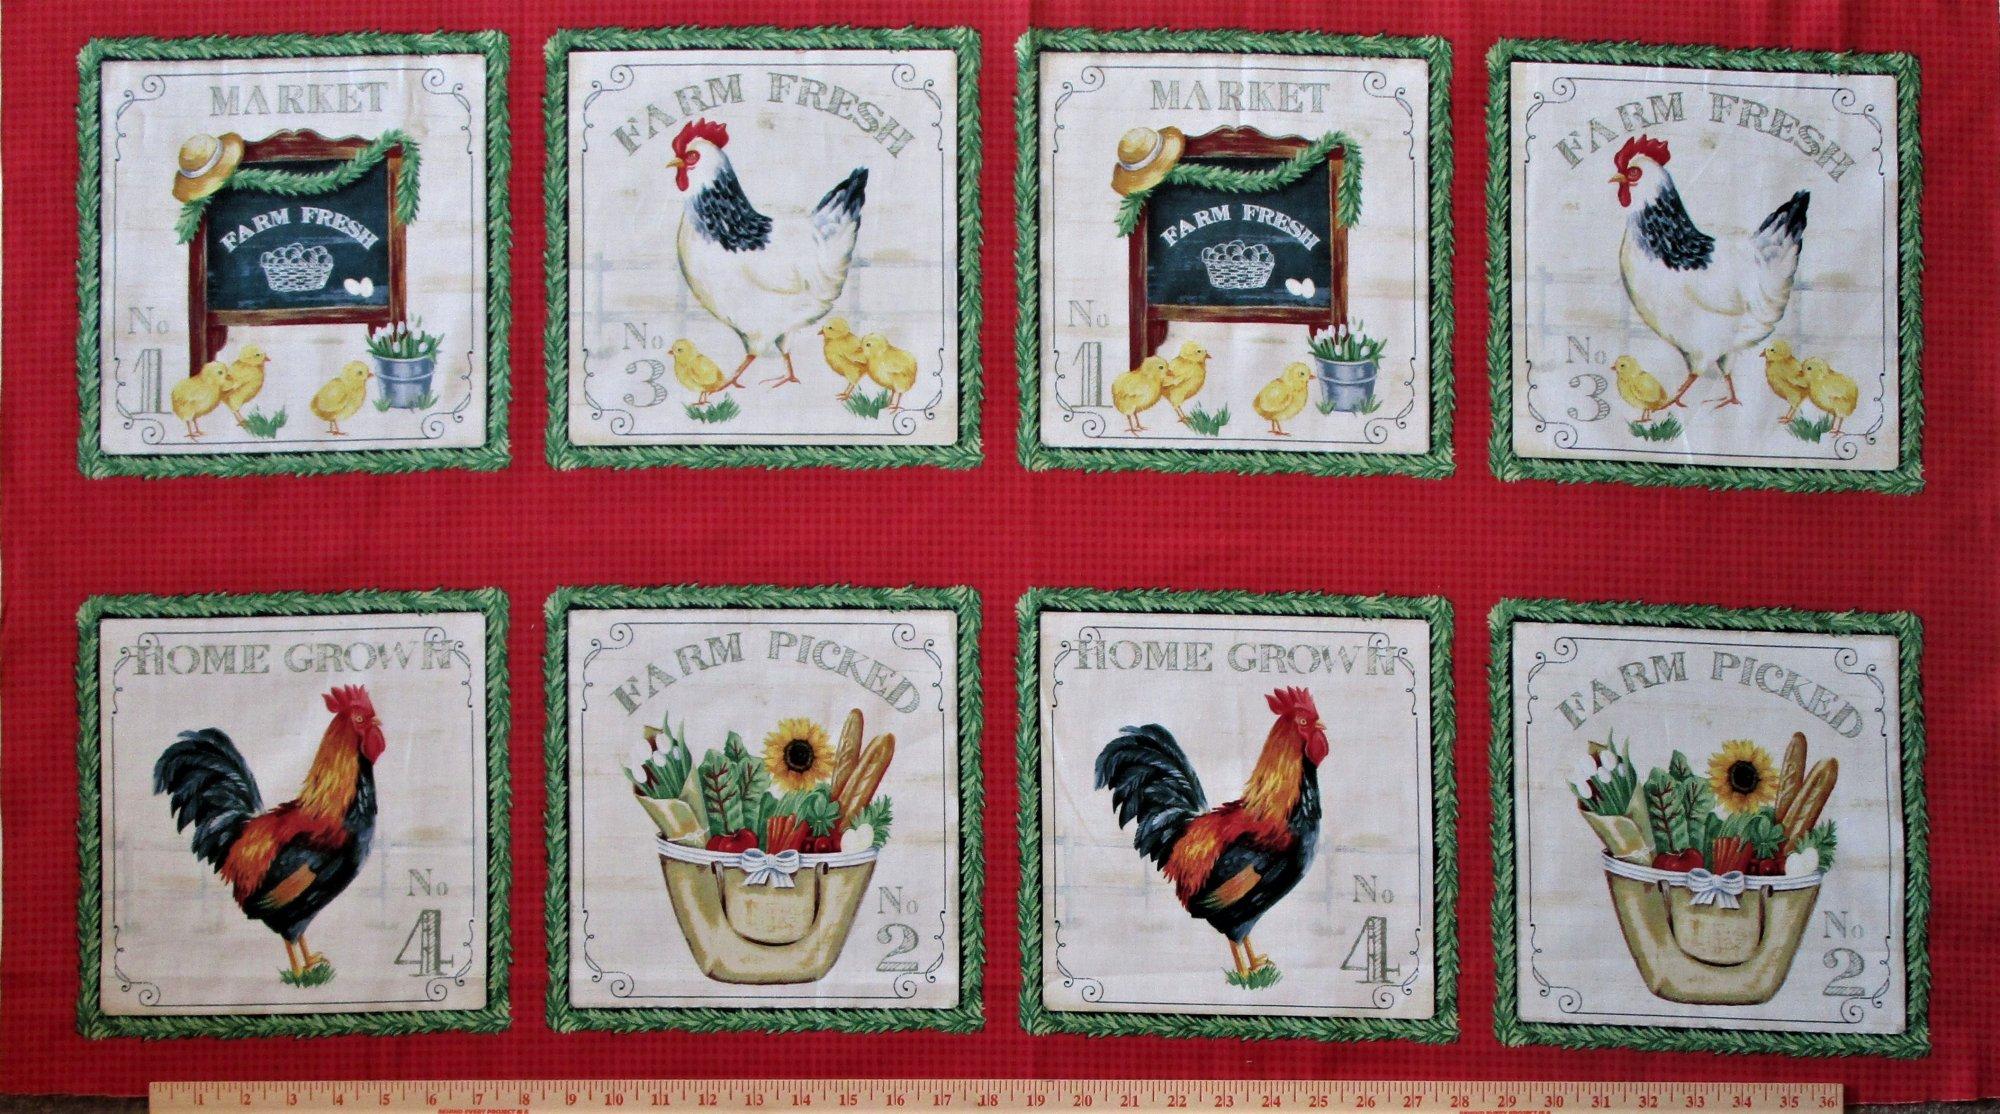 Farm Fresh Sunflower Market 50618P-X Panel